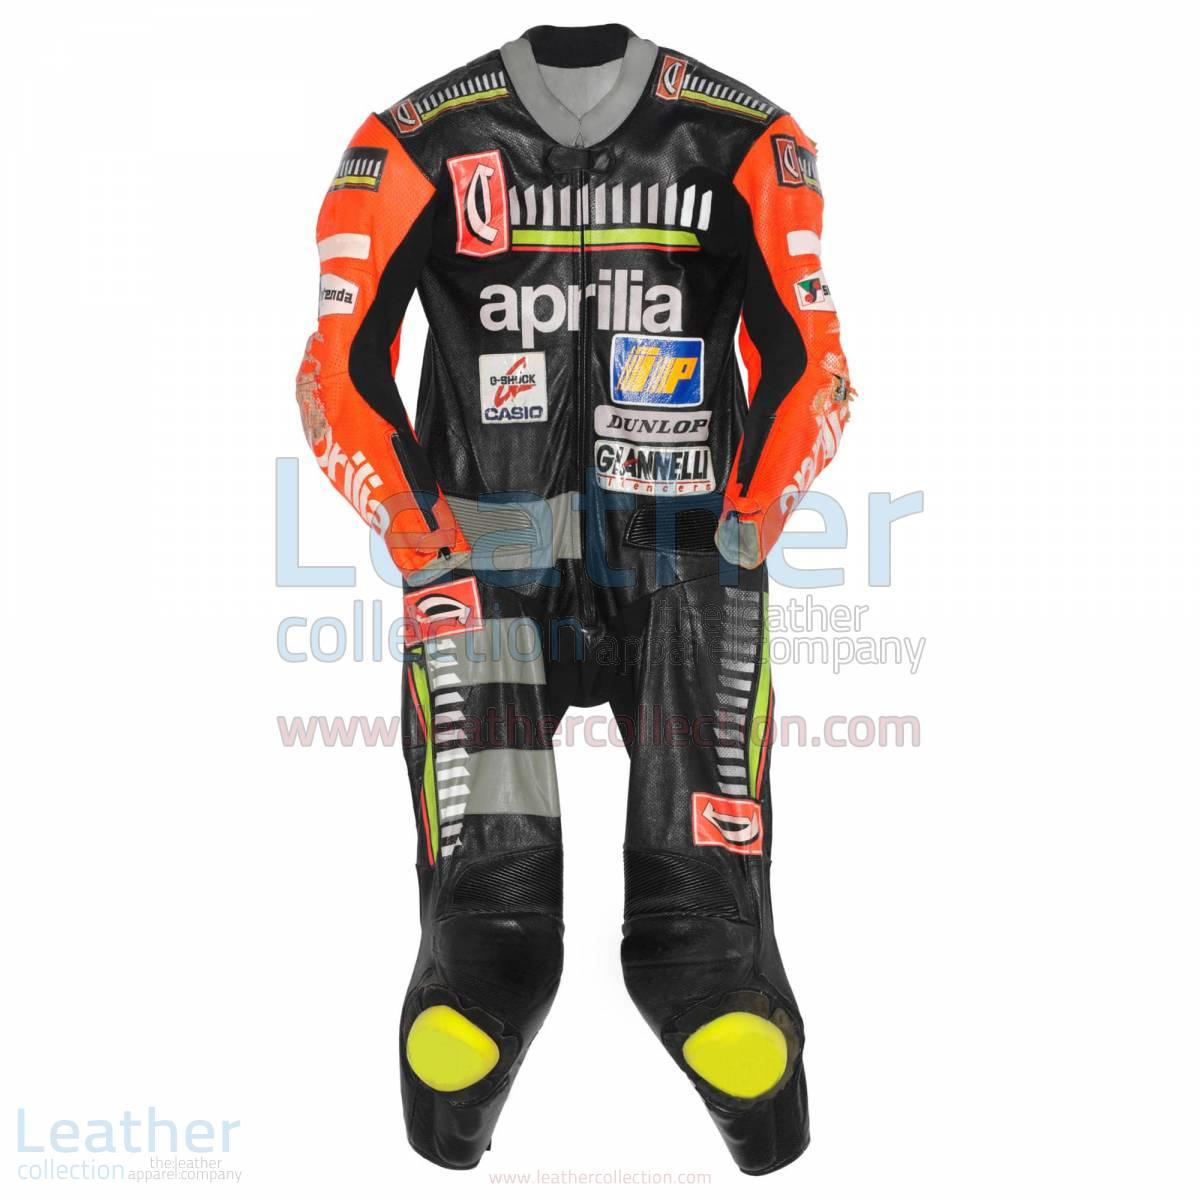 Max Biaggi Aprilia GP 1995 Racing Leathers